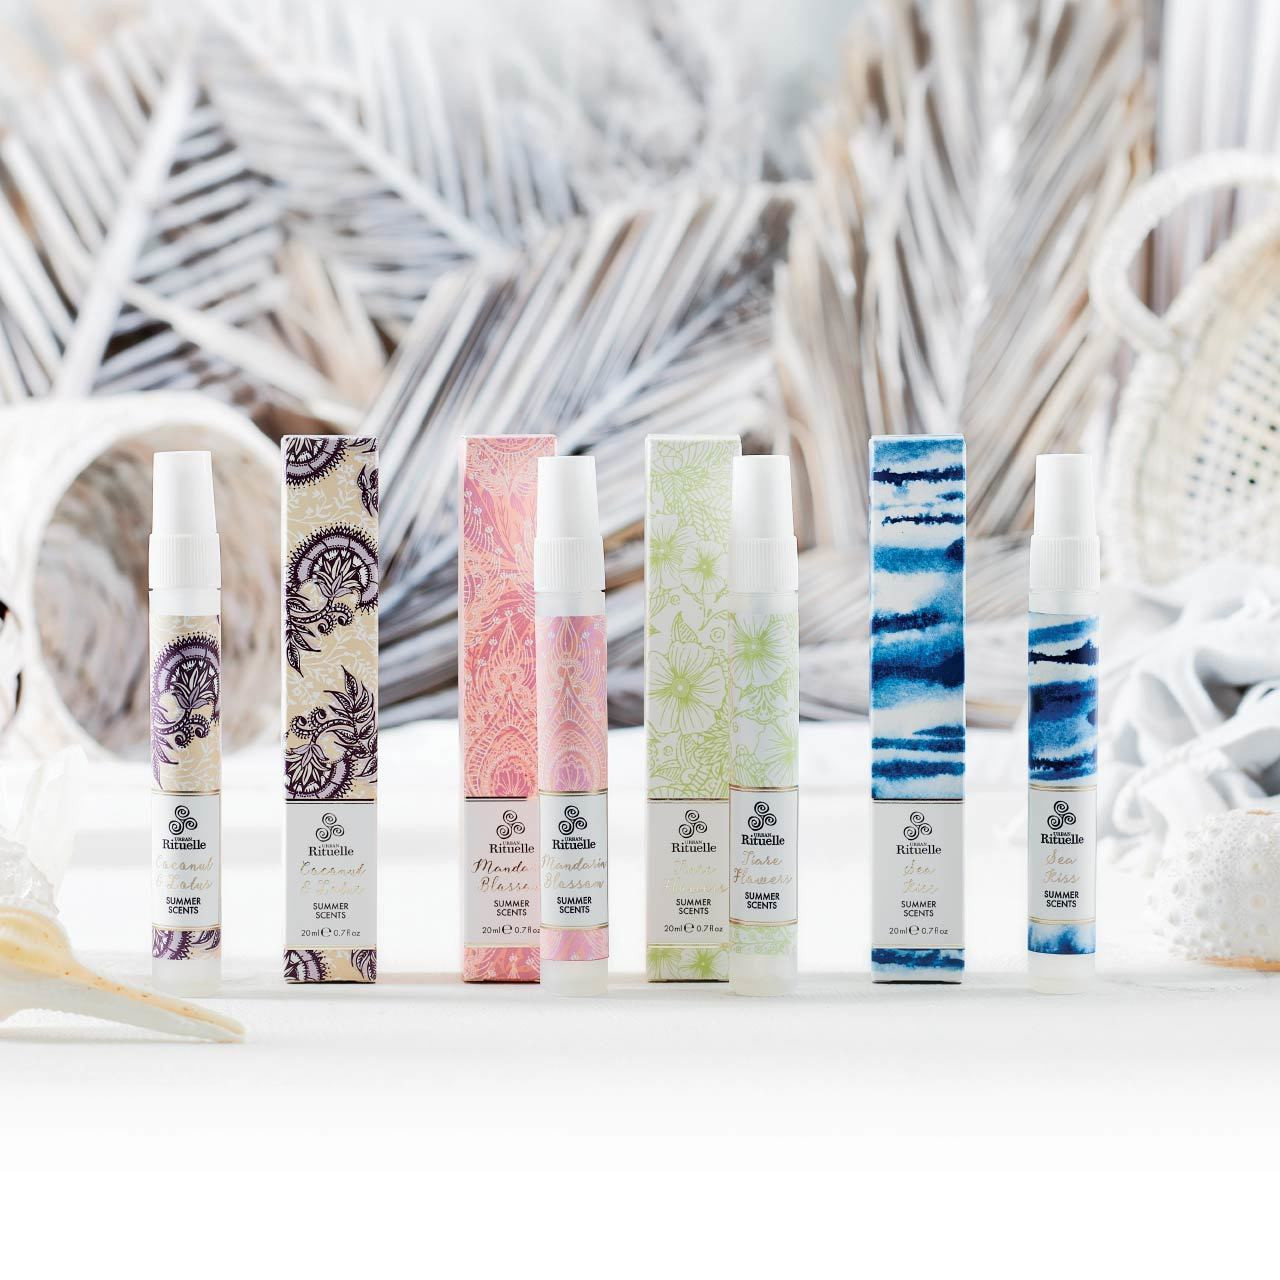 Summer Scents Perfumes - Urban Rituelle